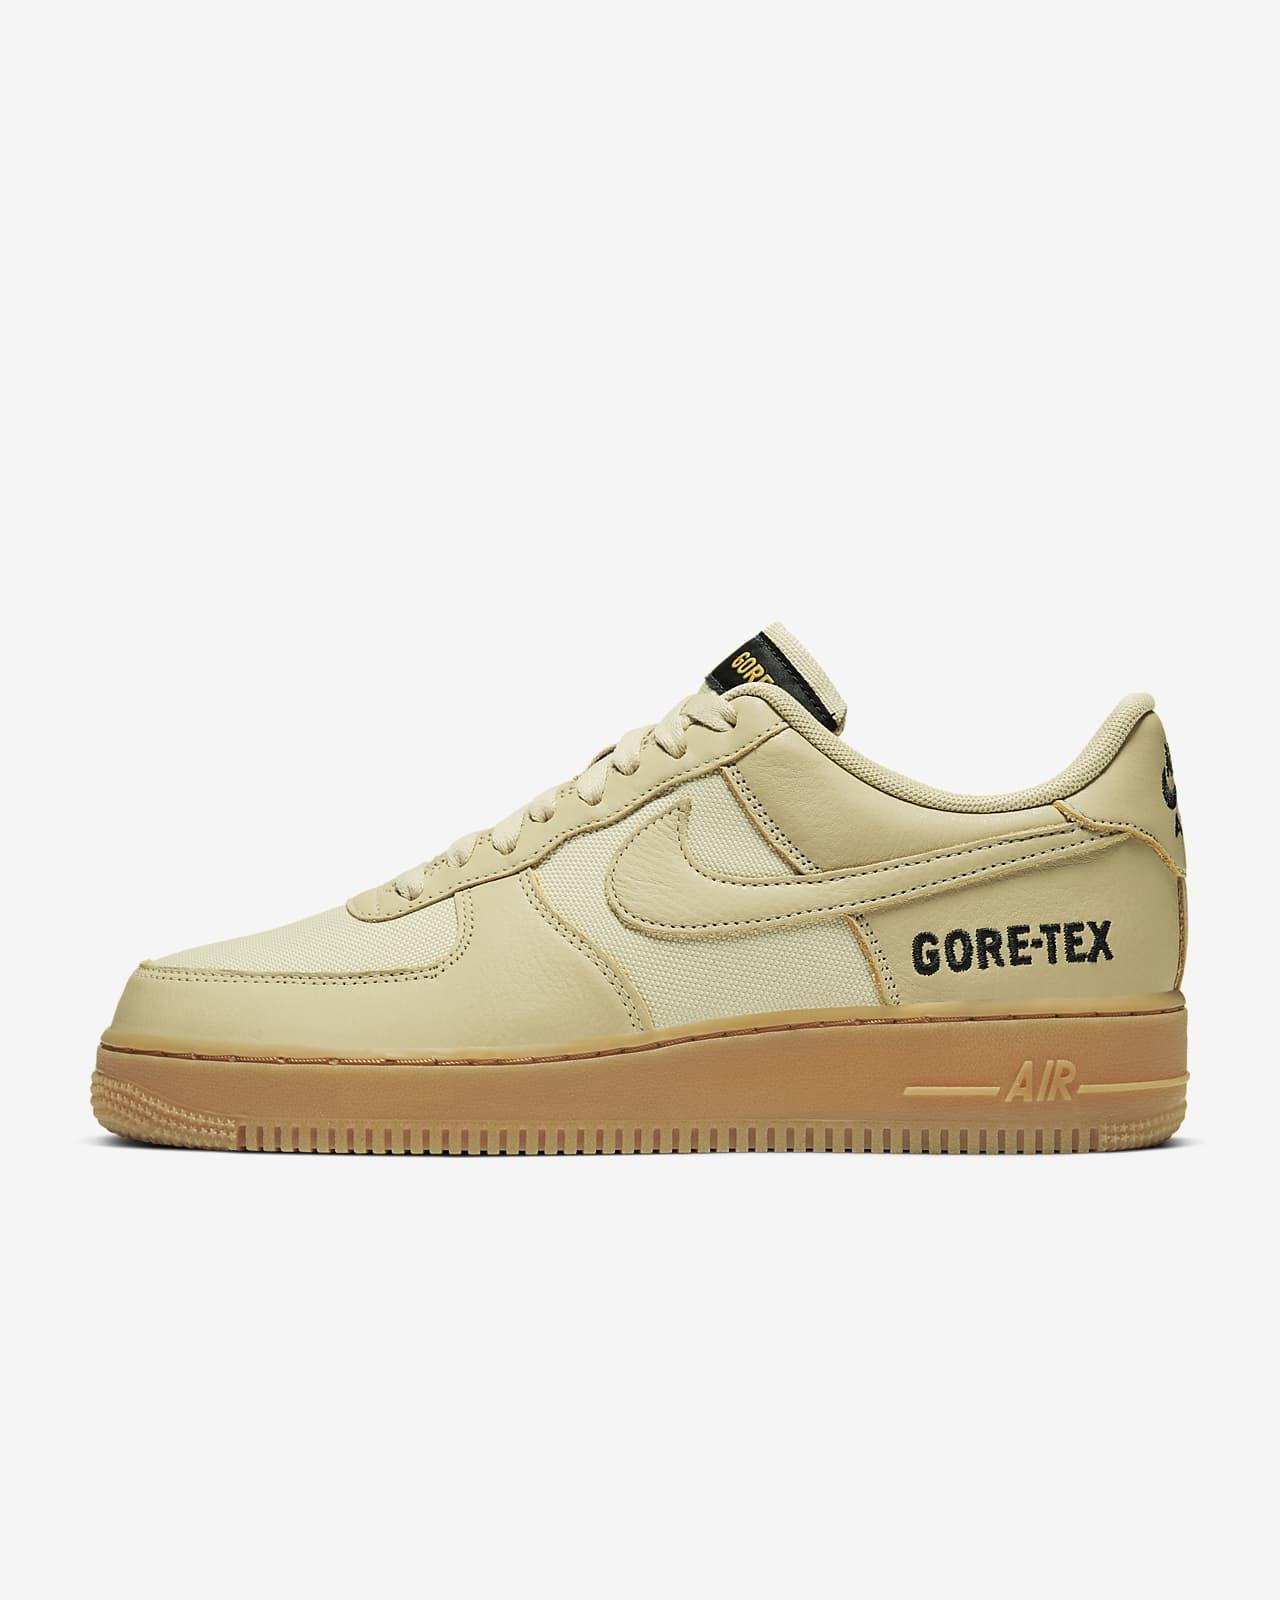 Nike Air Force 1 GORE-TEX 鞋款